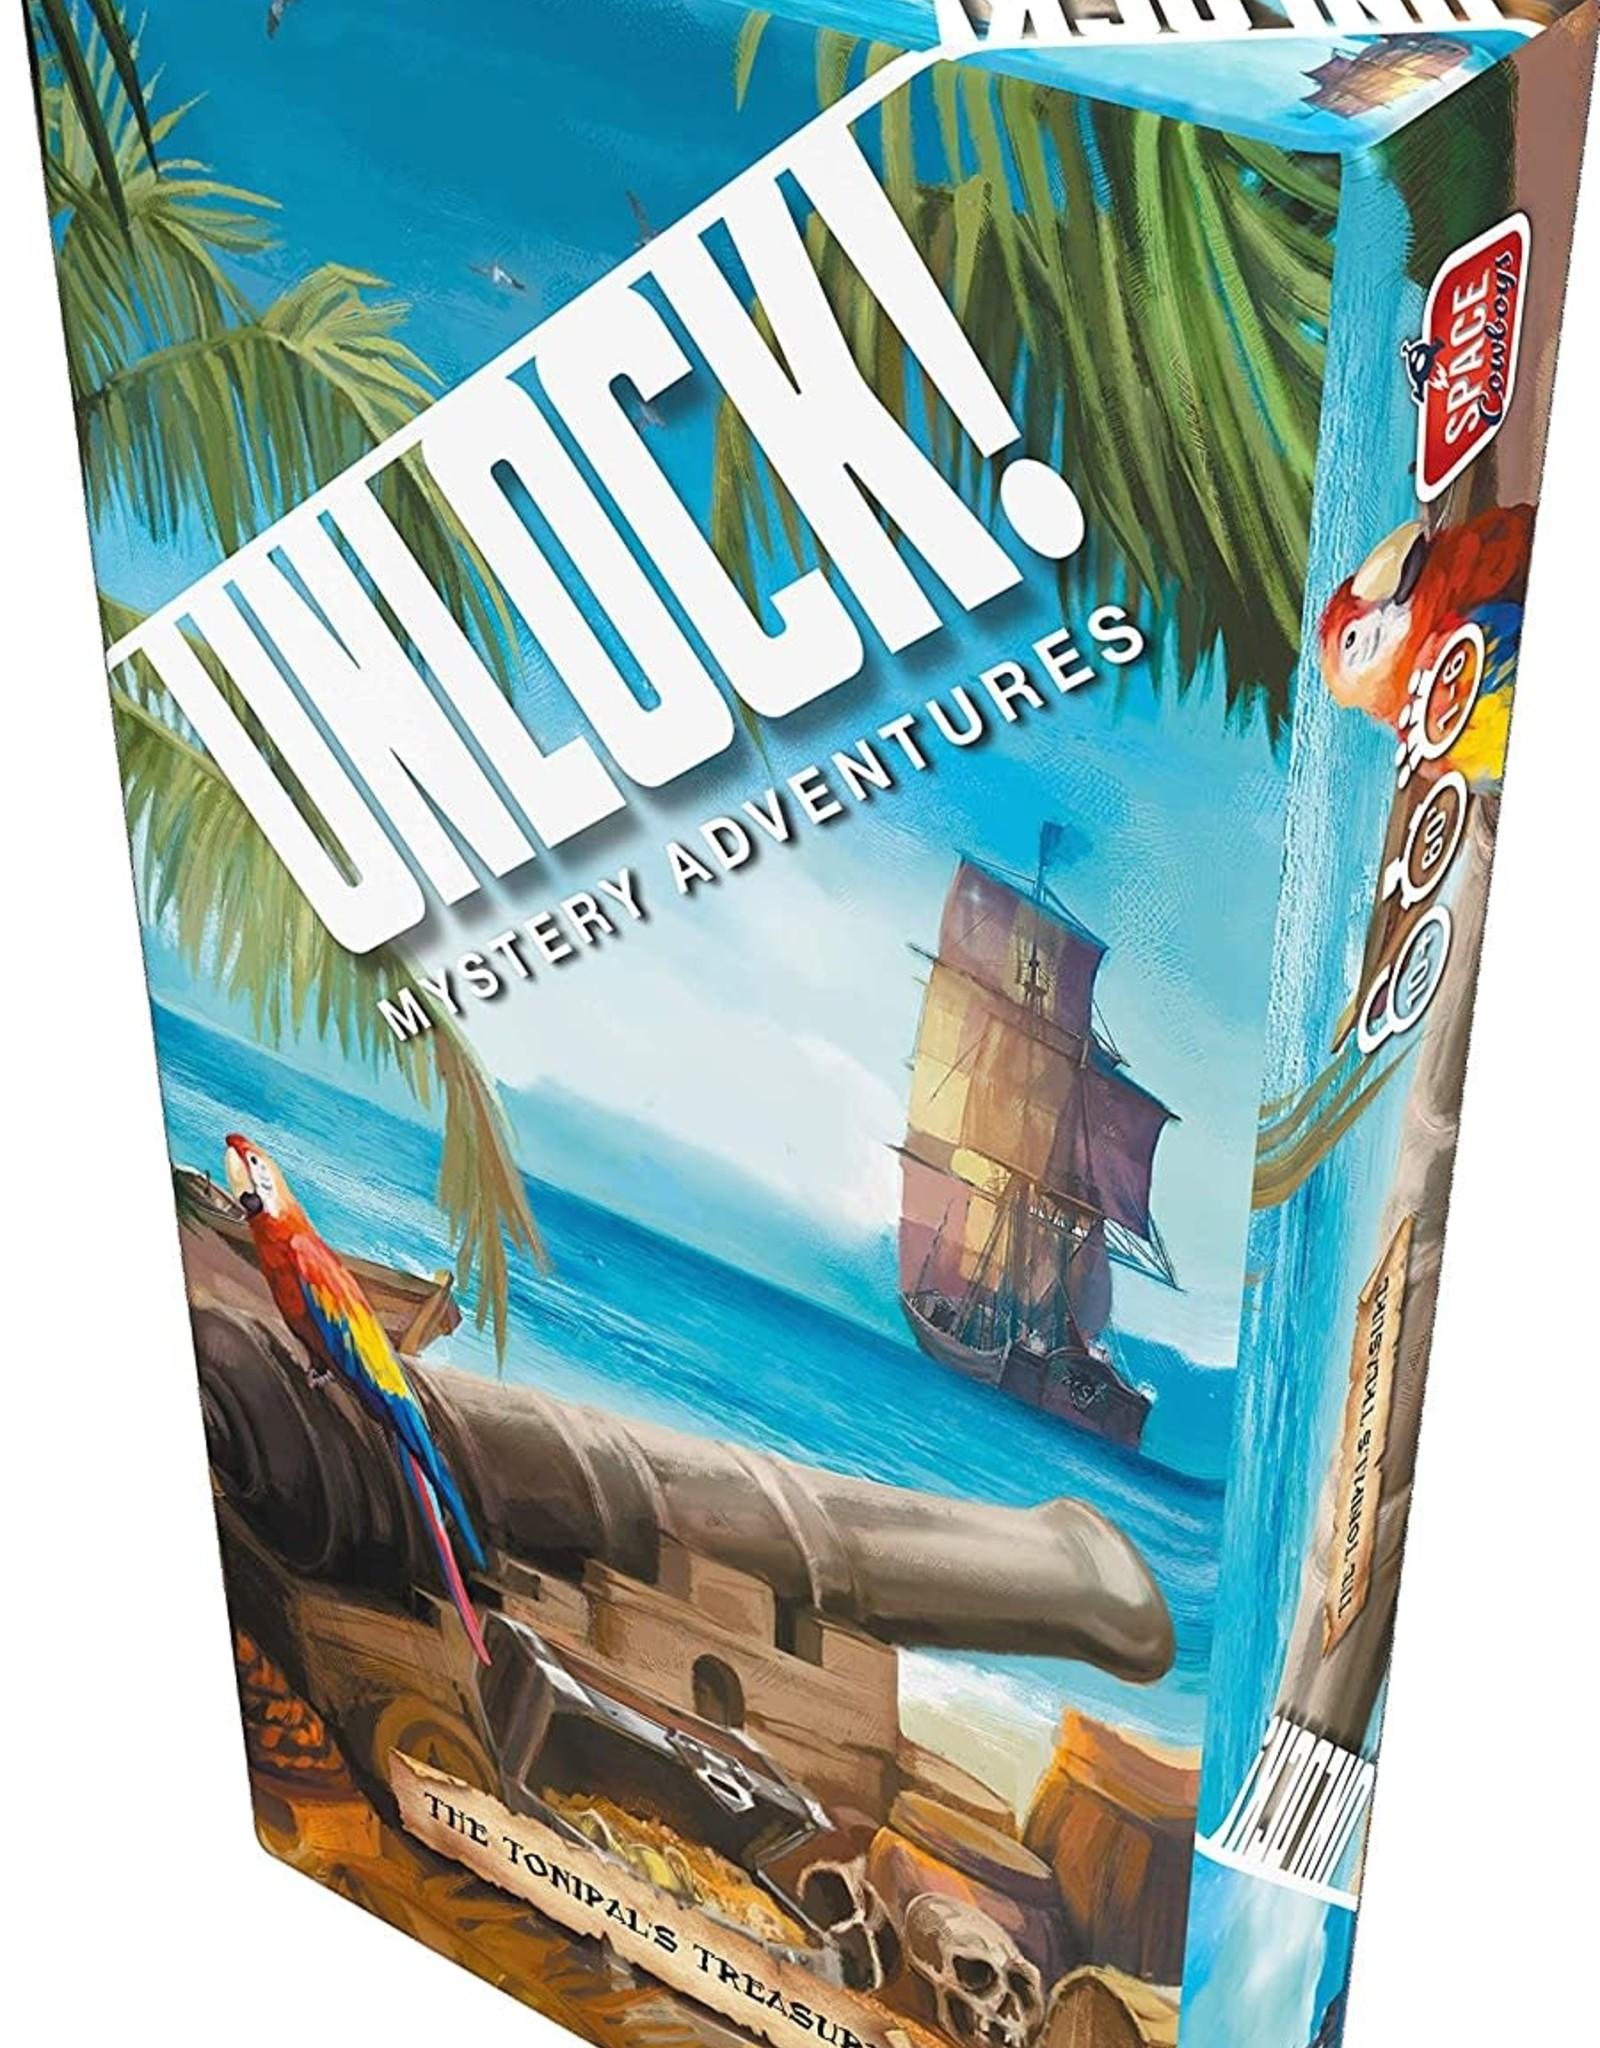 RENTAL - UNLOCK! The Tonipal's Treasure 8.6 oz